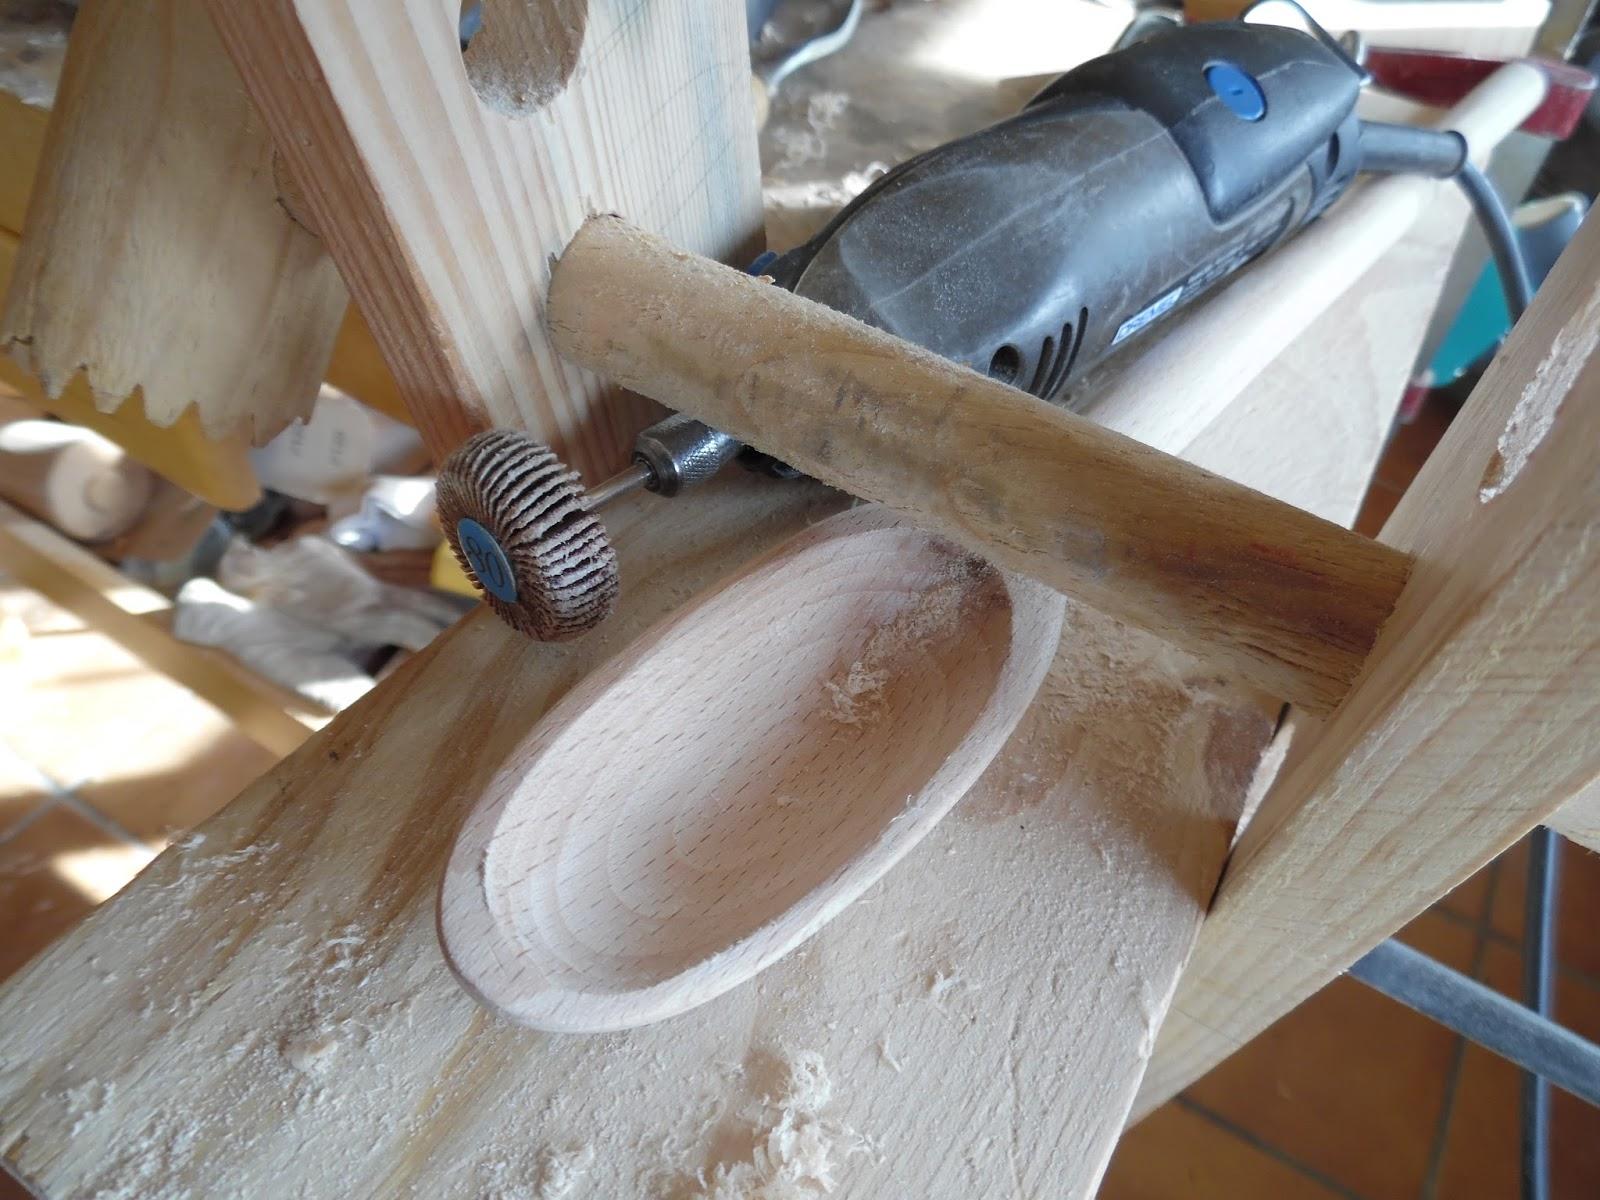 El rinc n de un aprendiz una cuchara en madera de haya - Lija para taladro ...